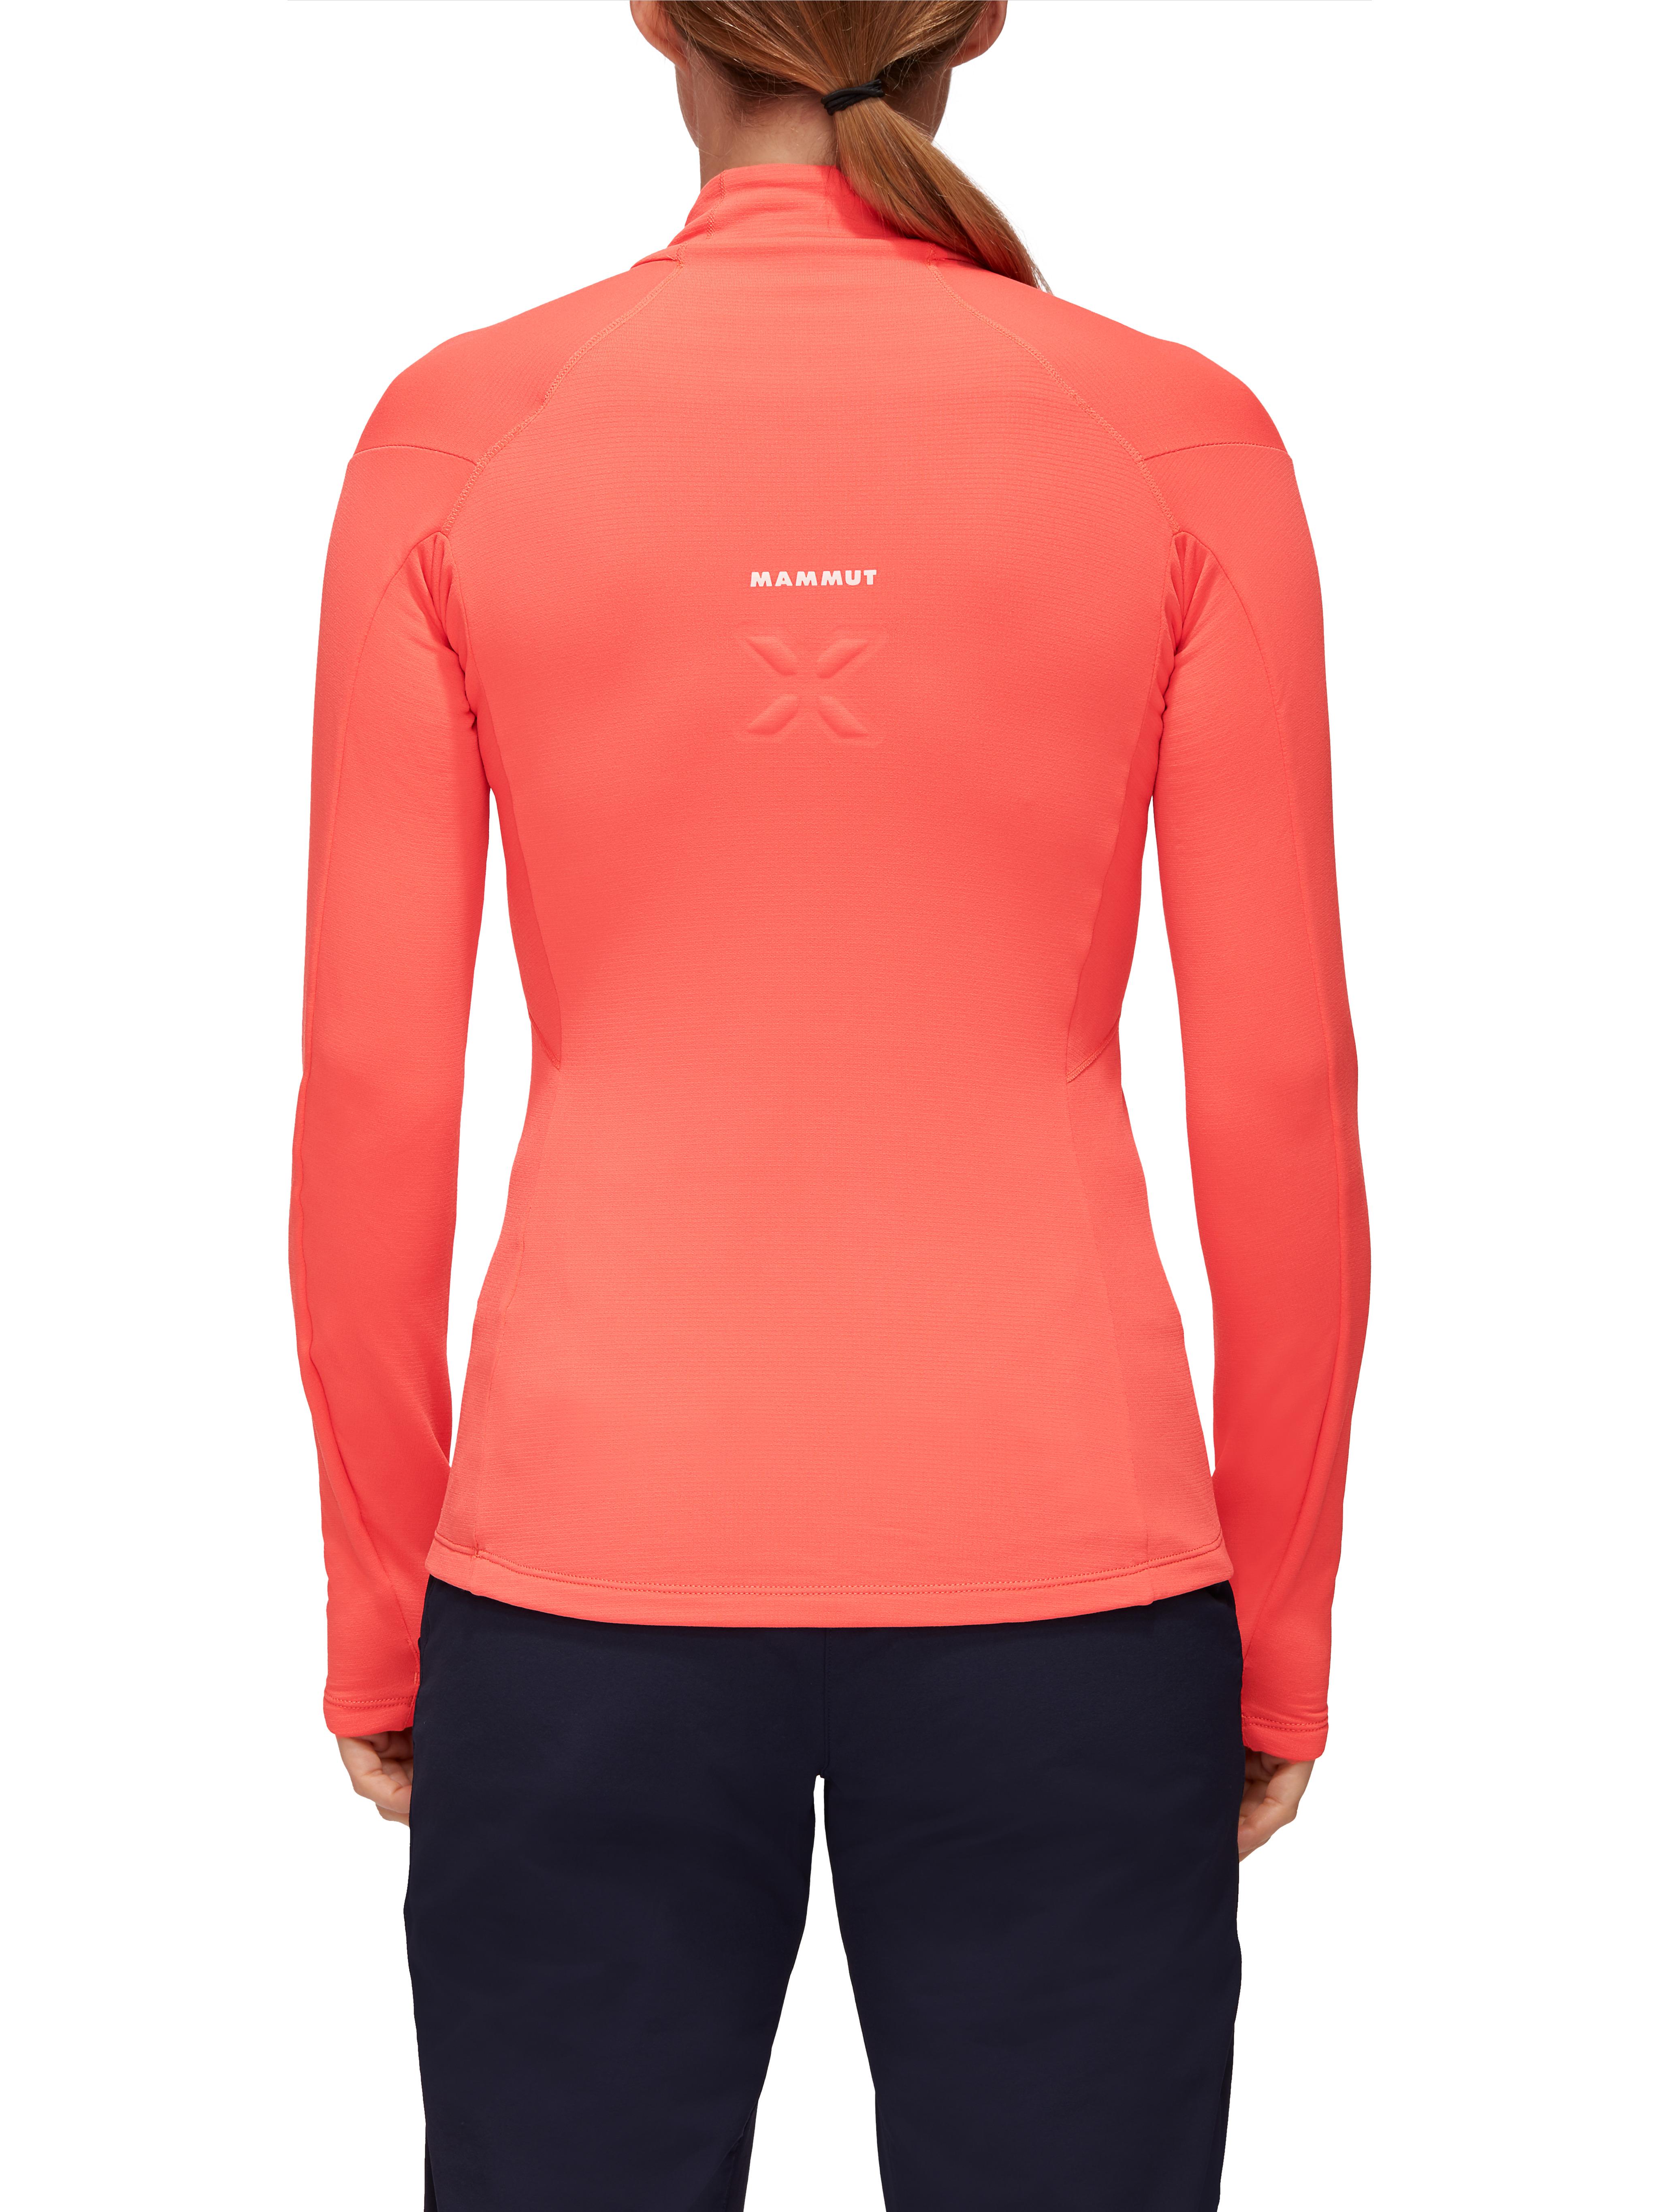 Moench Advanced Half Zip Longsleeve Women product image